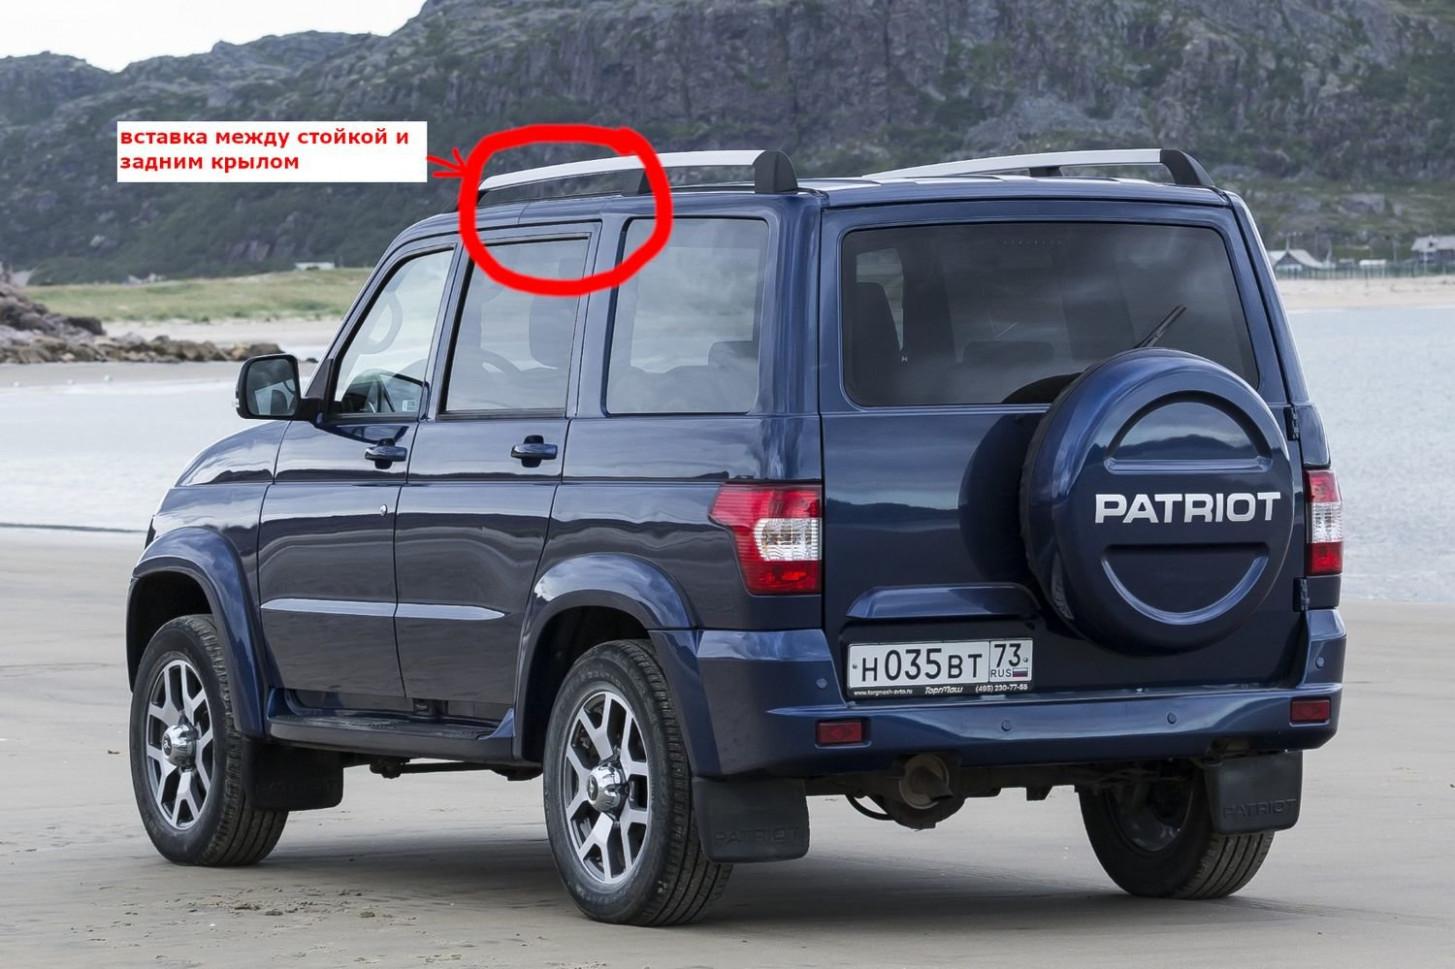 New Concept Jeep Patriot 2022